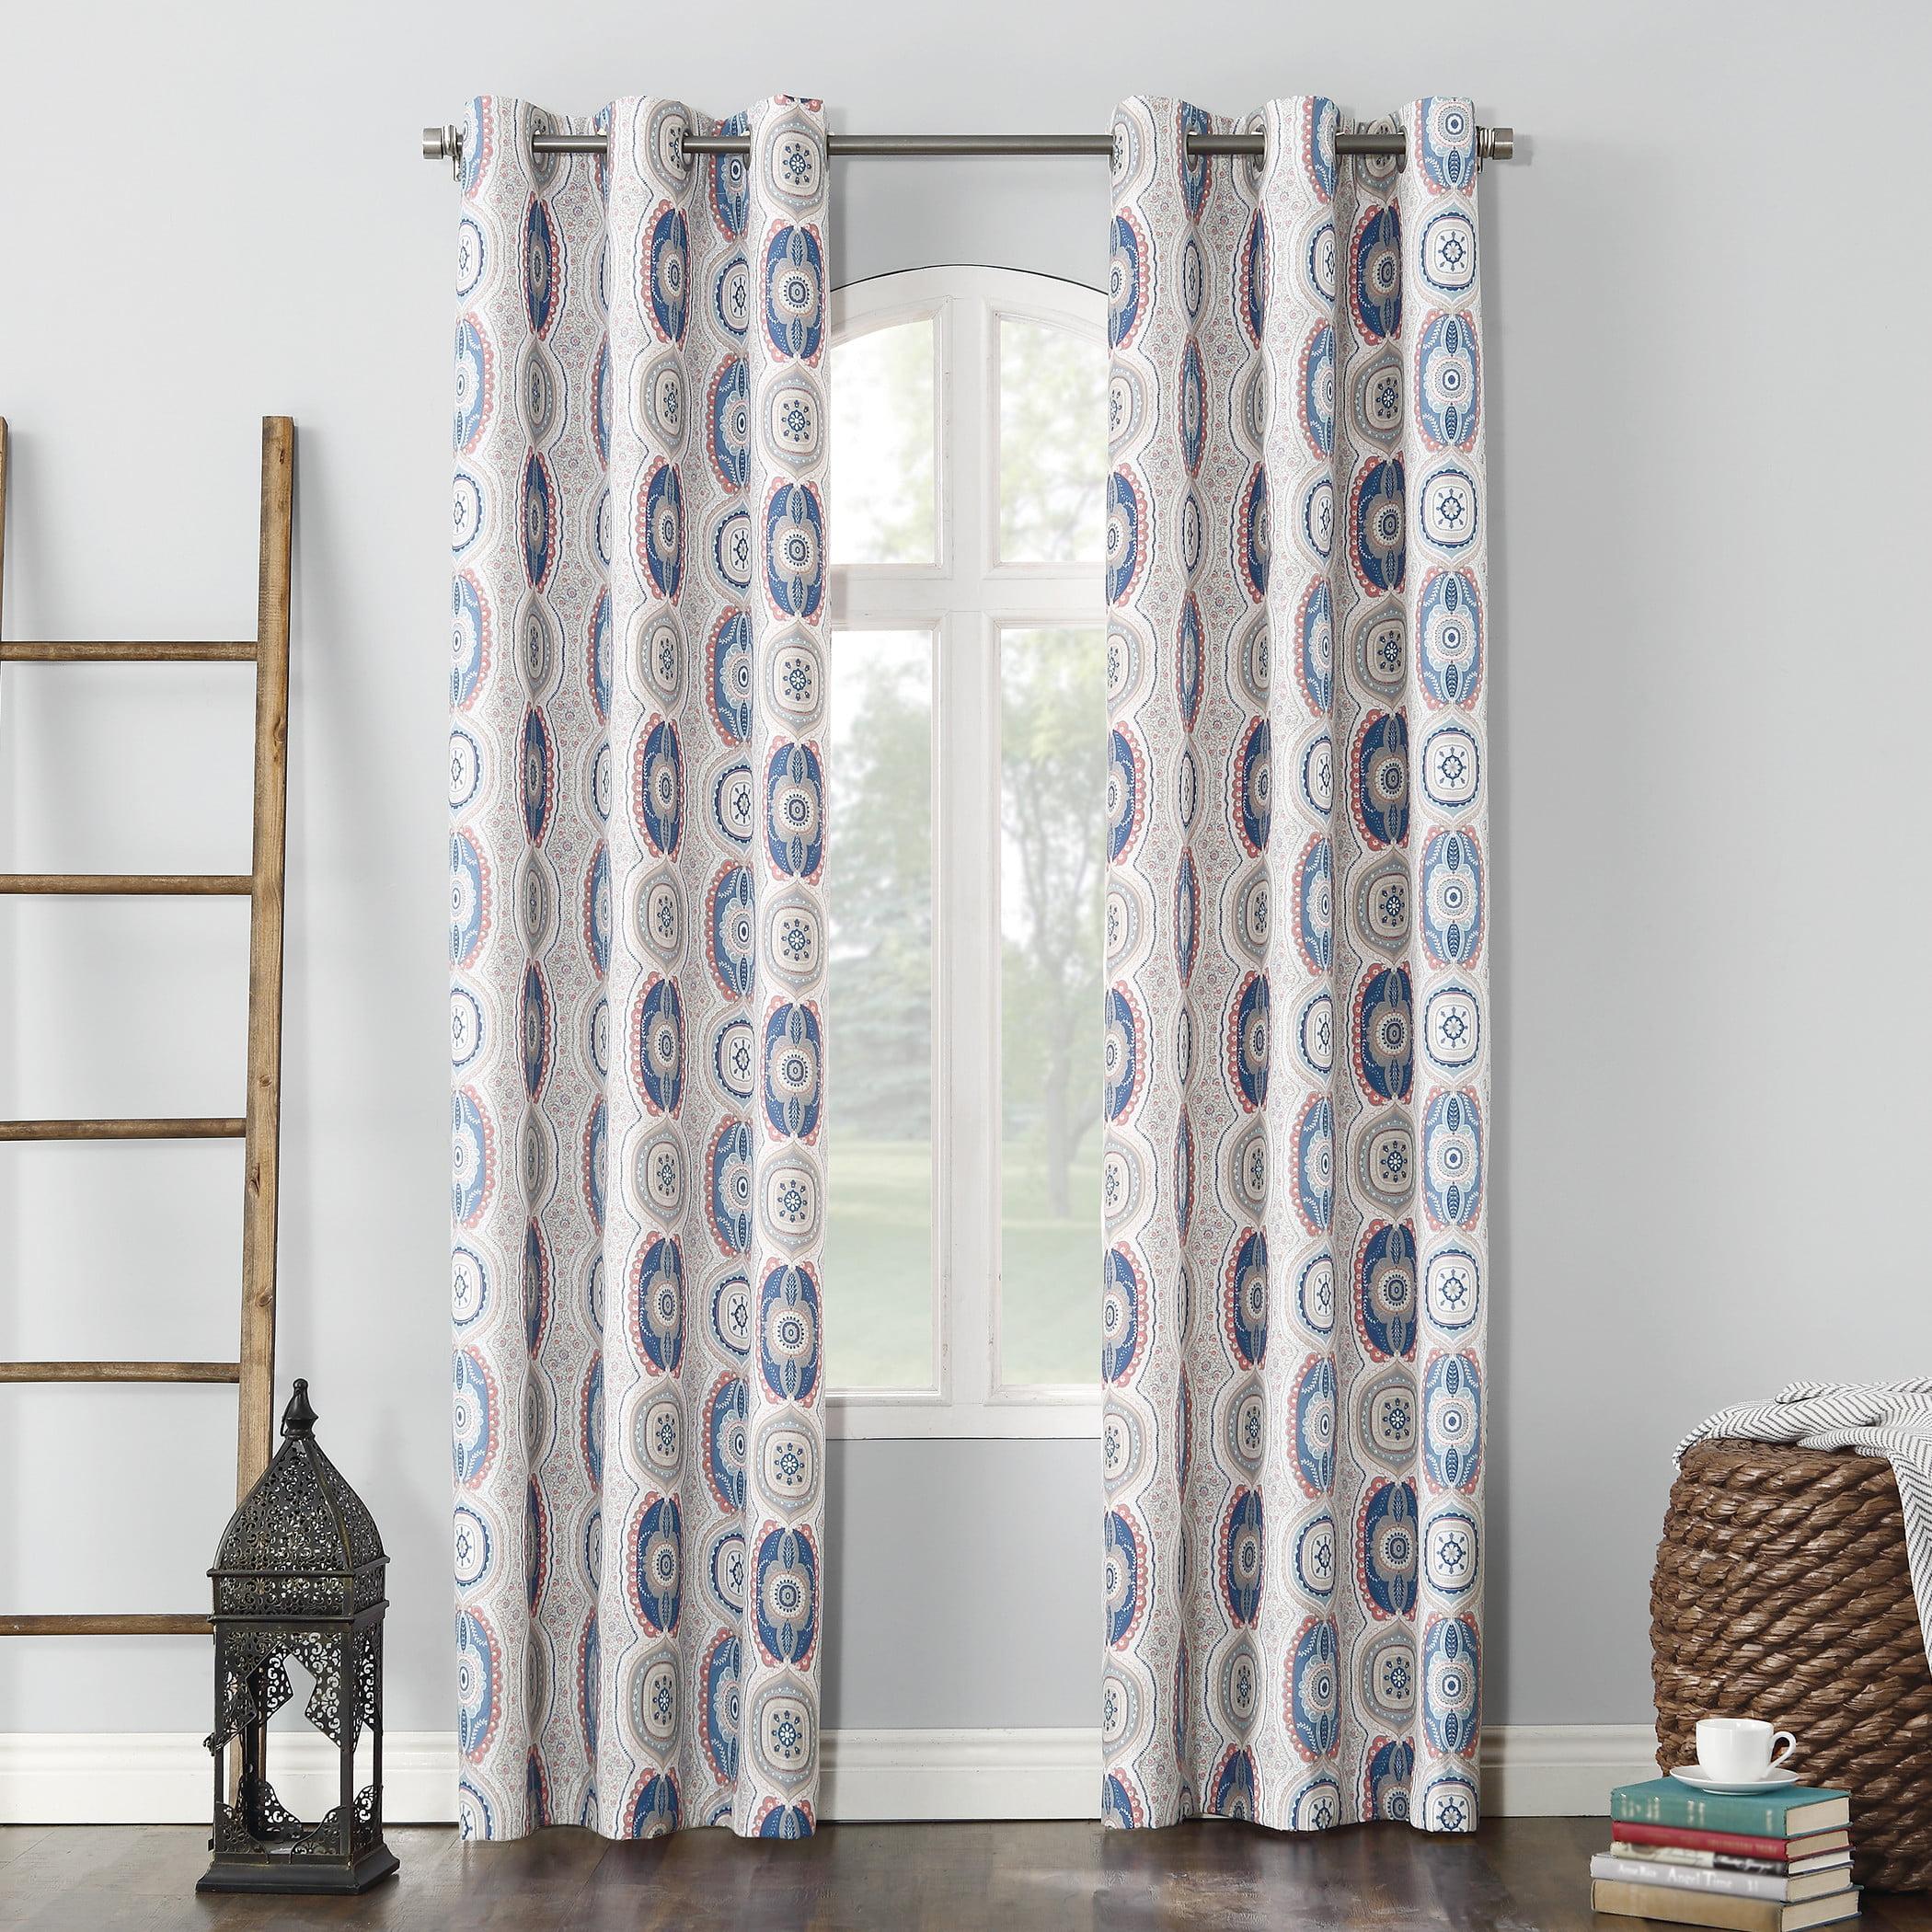 Sun Zero Cordoba Folklore Thermal Insulated Energy Efficient Grommet Curtain Panel